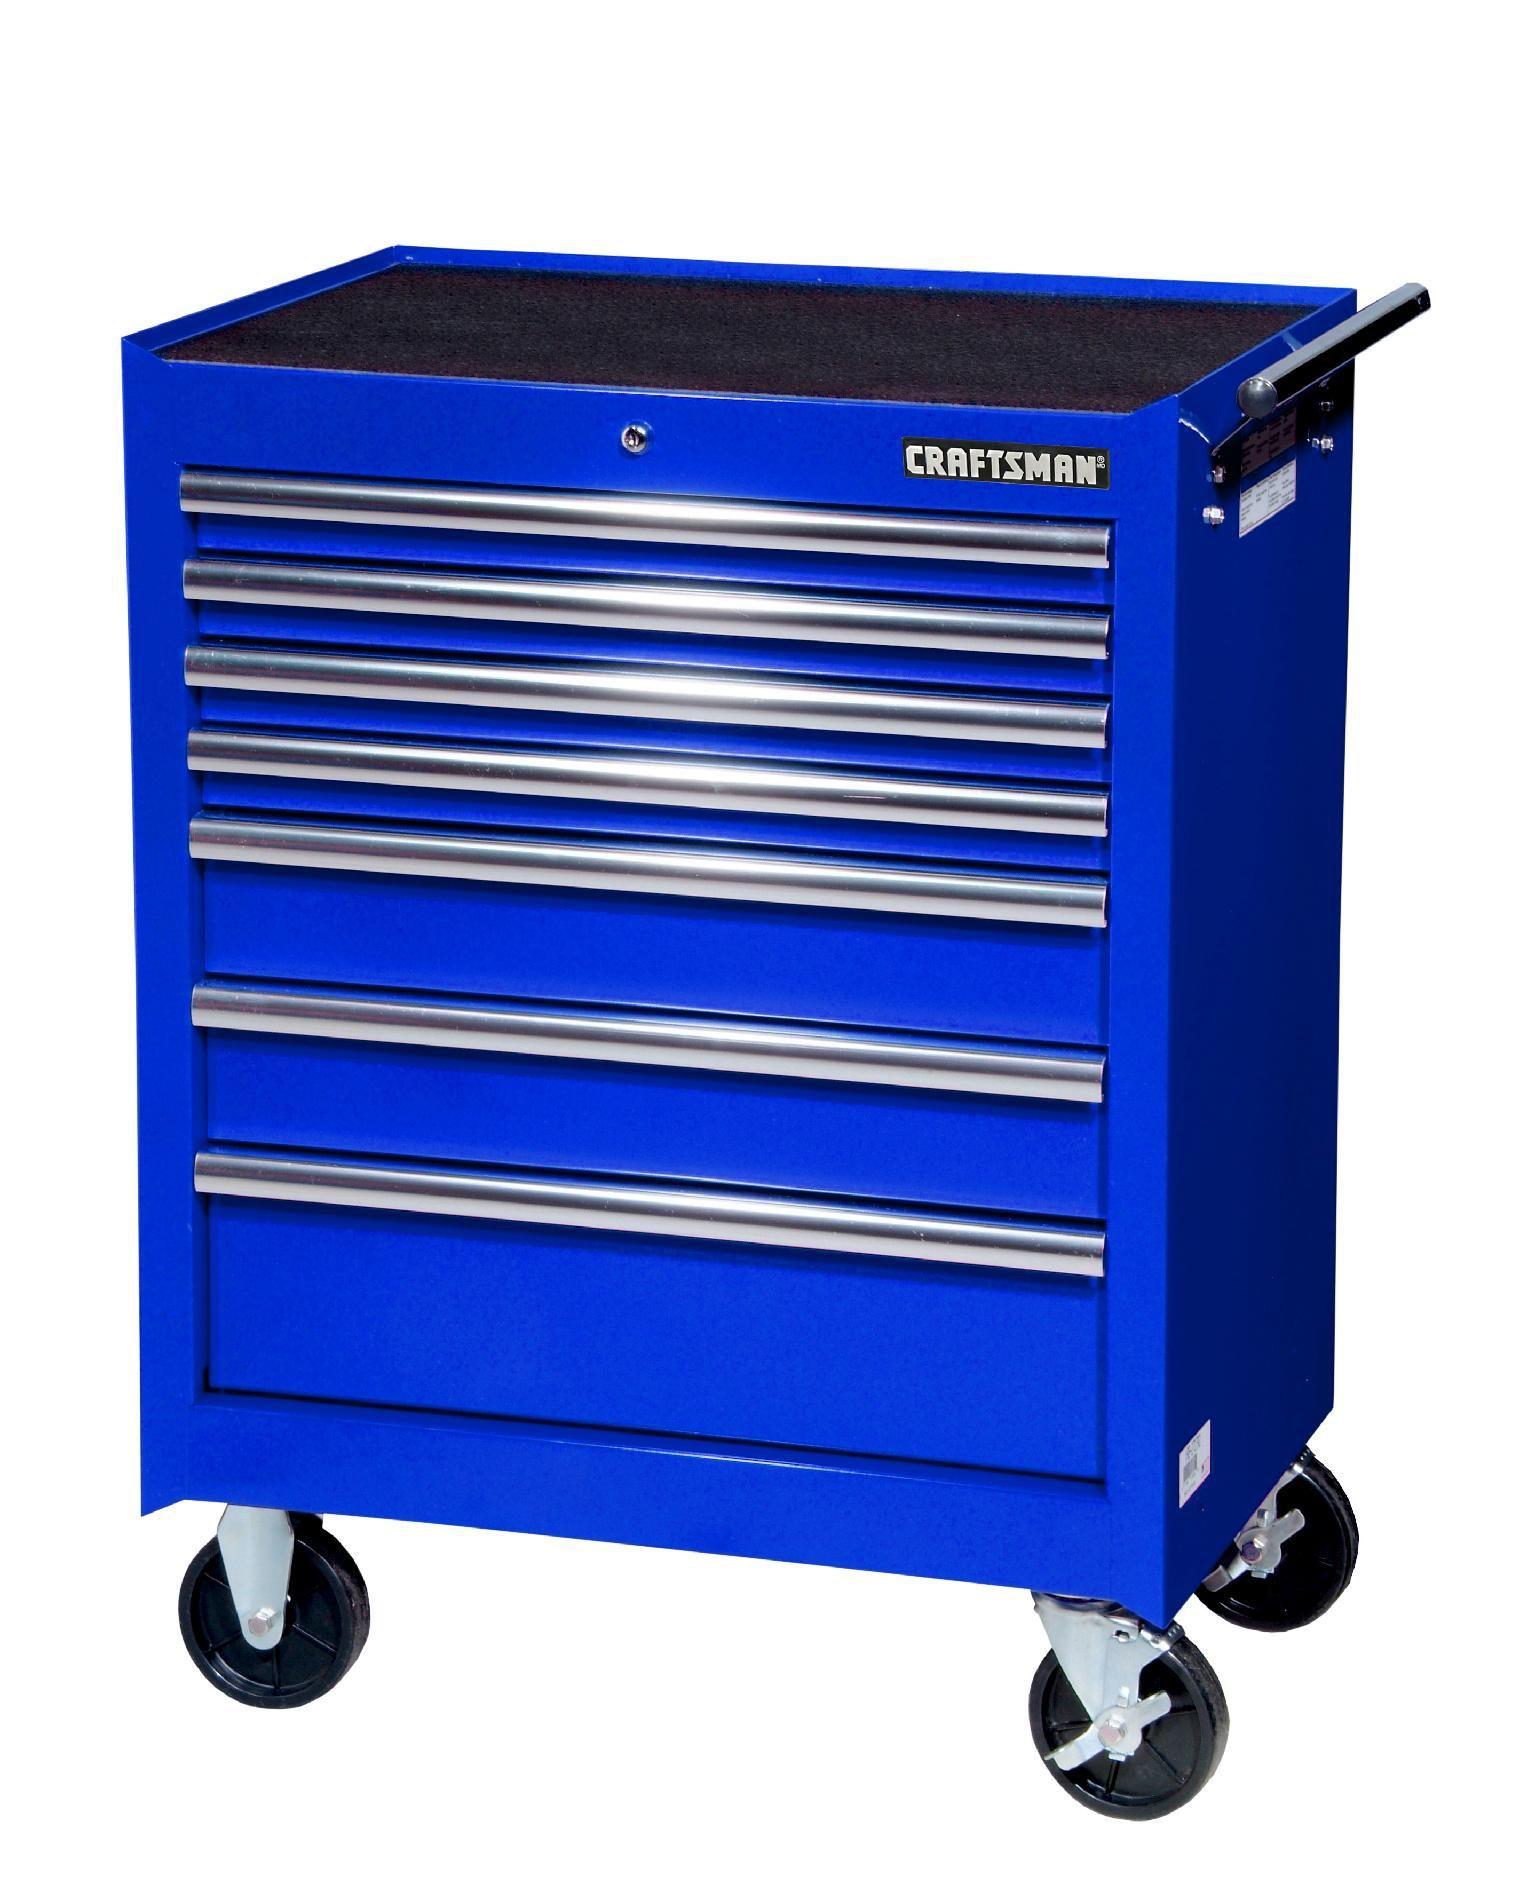 Craftsman 27 7 Drawer Roller Cabinet Blue Pro Tool Storage At